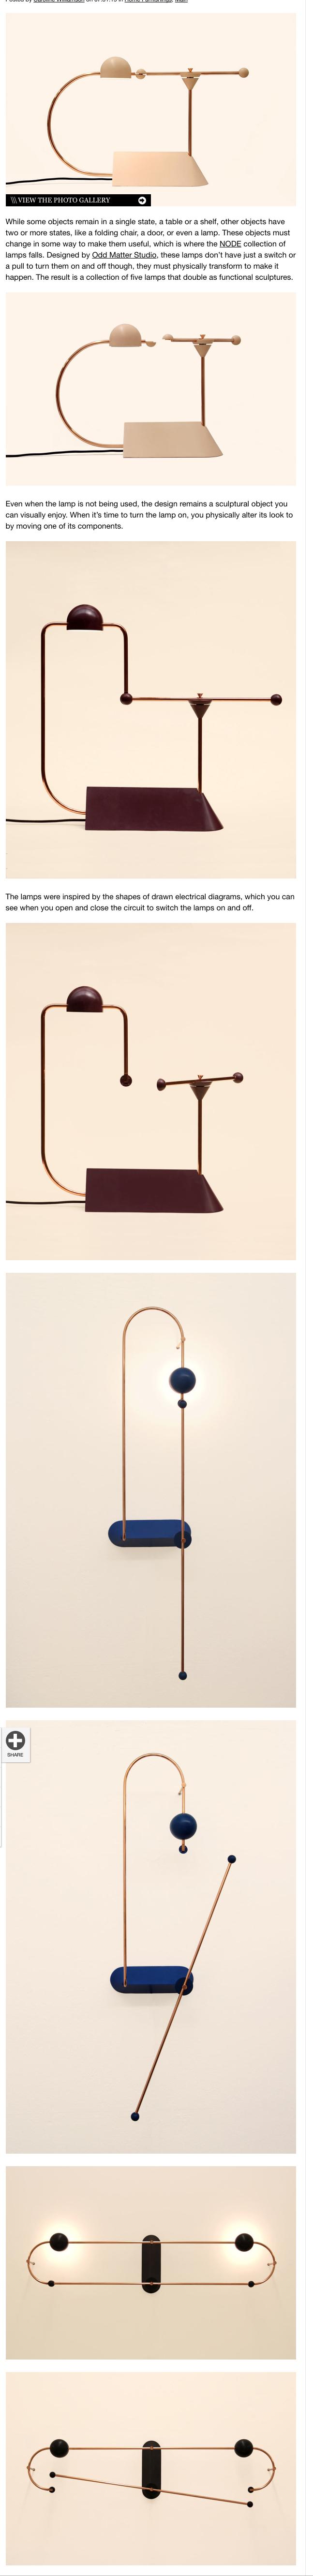 http://design-milk.com/lamps-sculptural-objects-transform-turned-off/